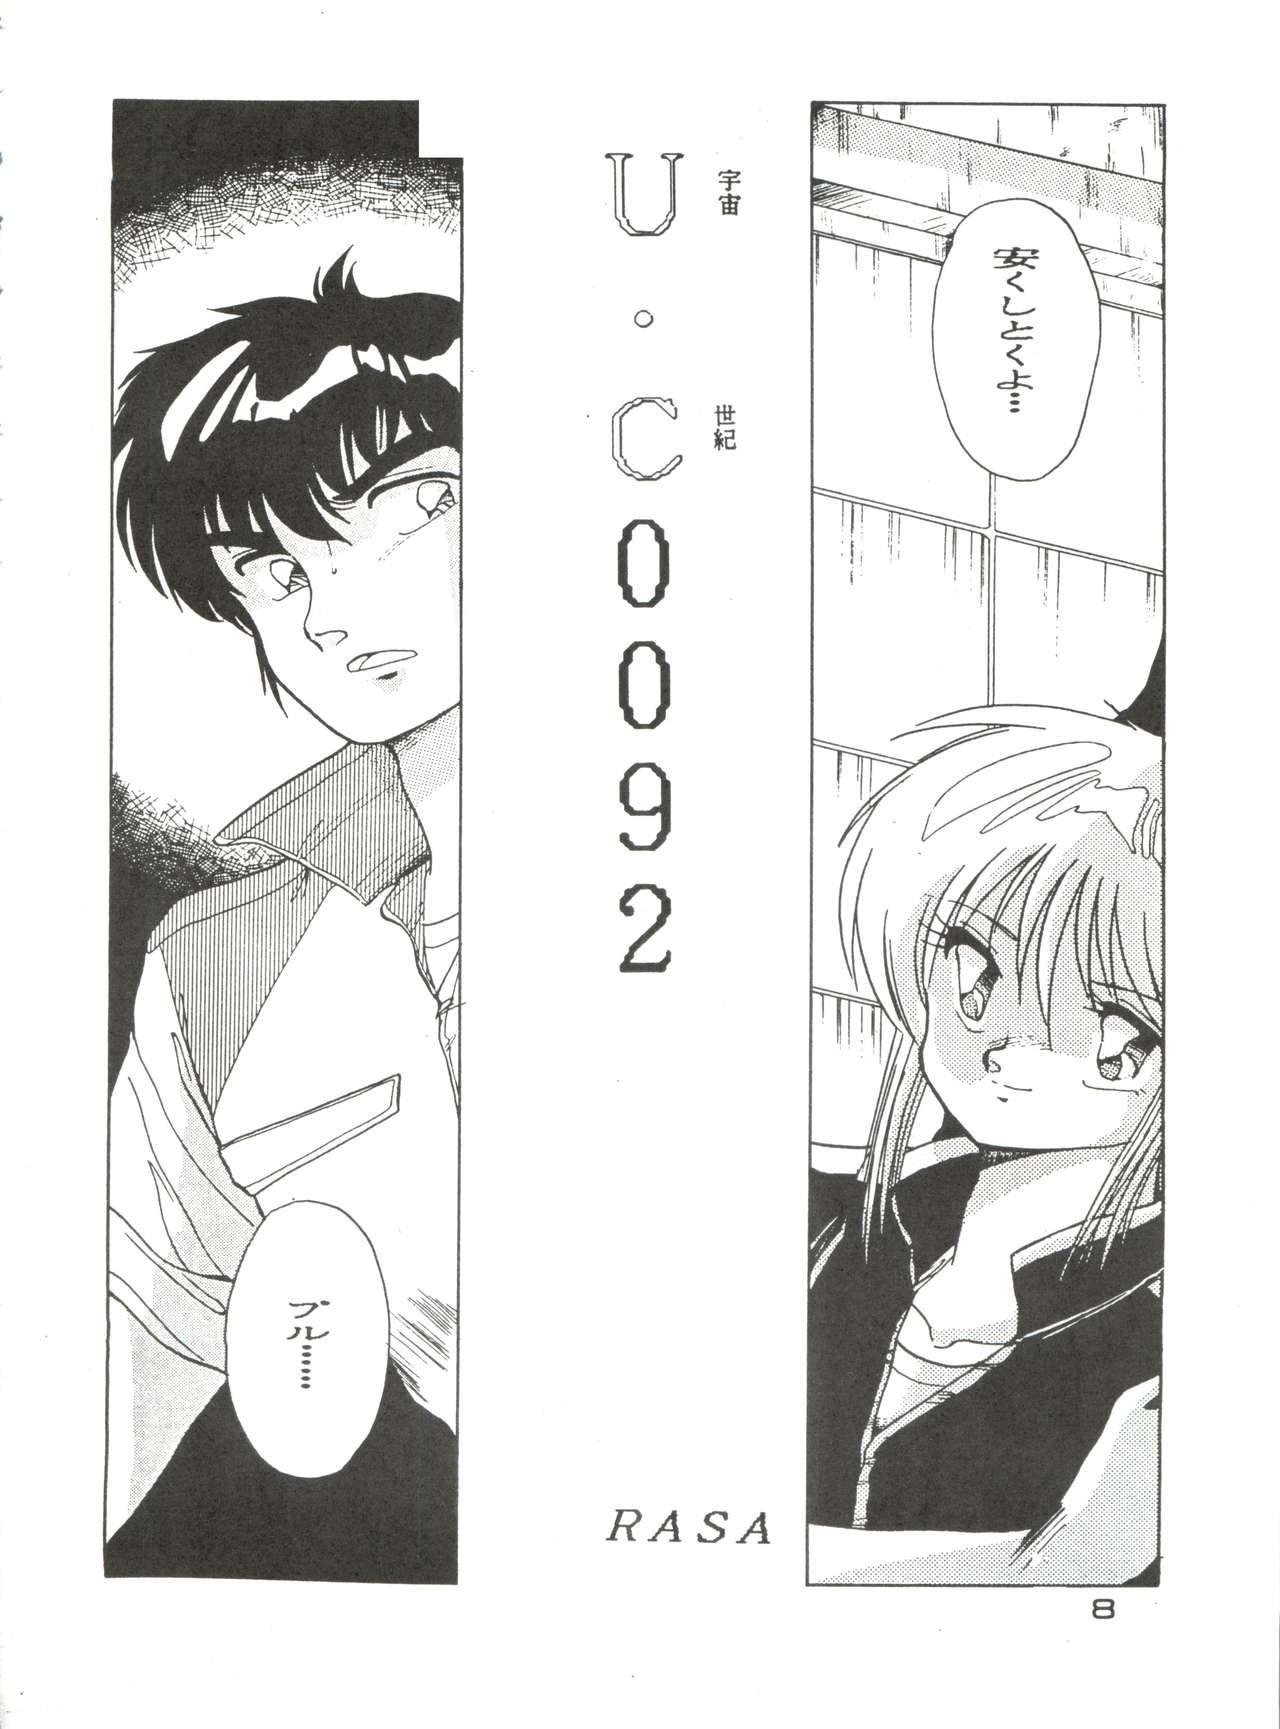 [Studio Fuck (Various) Onapet 7 (Sonic Soldier Borgman, Gundam ZZ, Osomatsu-kun) 7